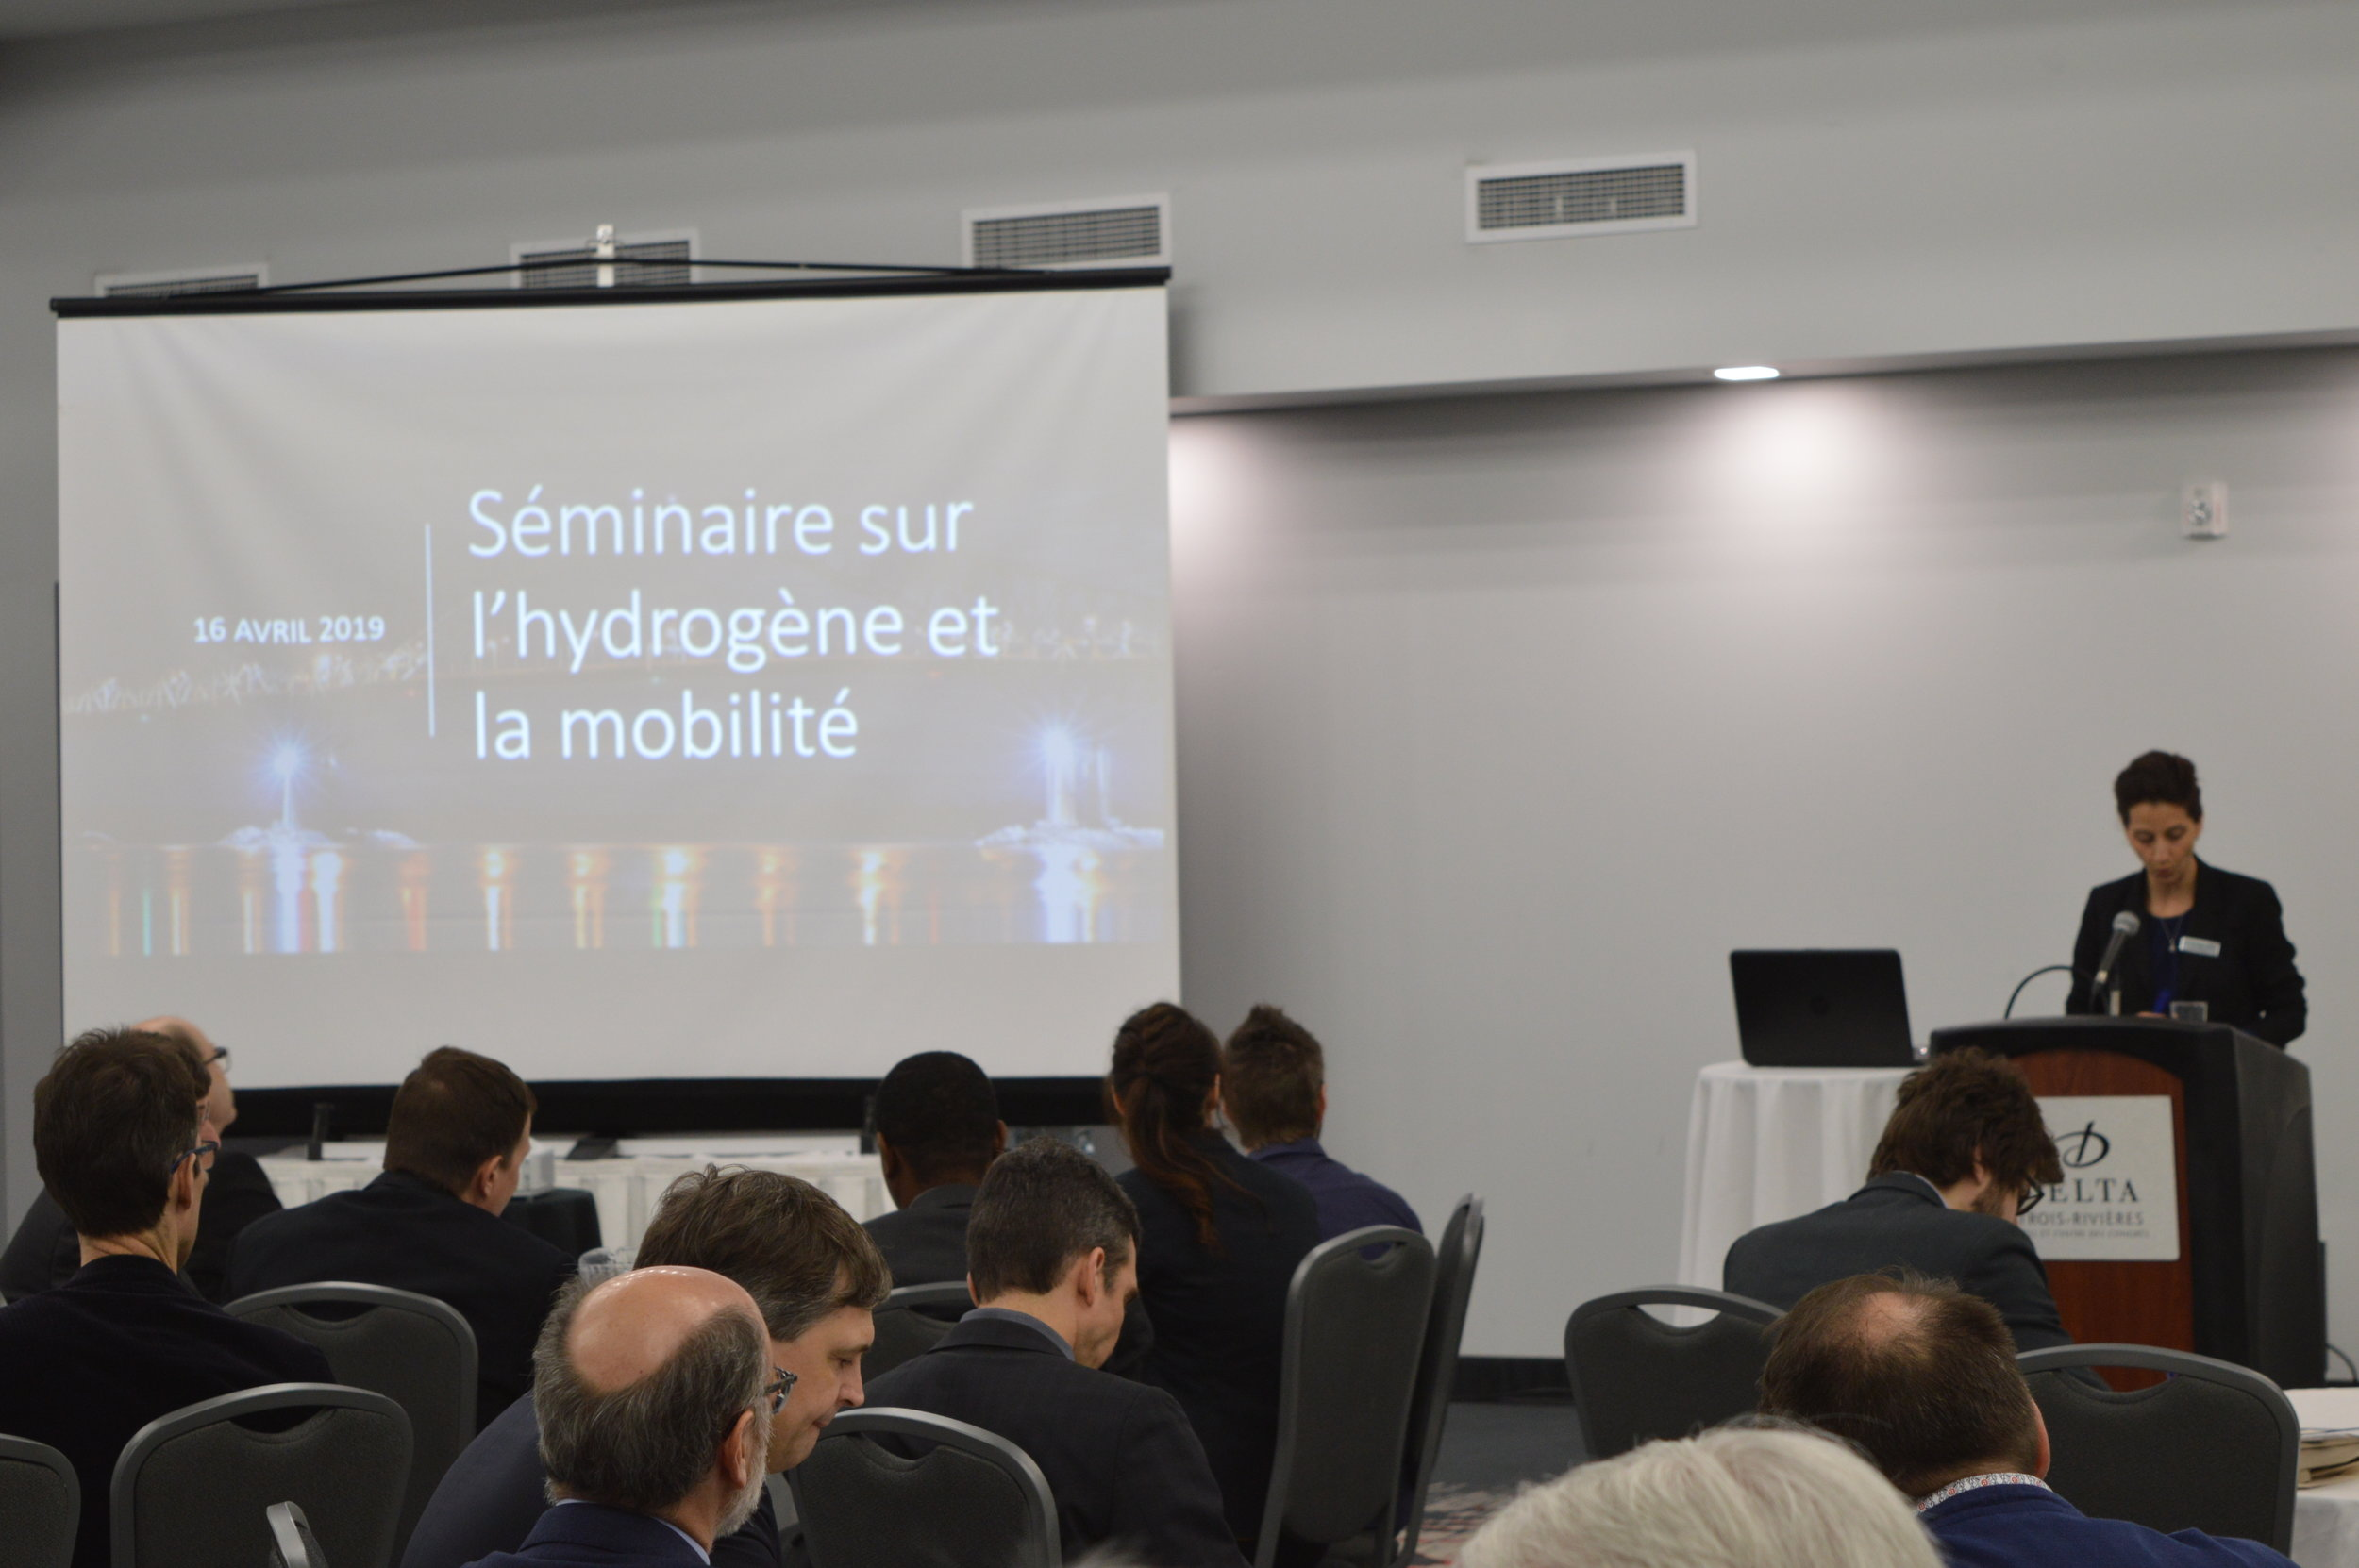 Ouverture du séminaire  par Josipa Petrunic // Opening of the seminar by Josipa Petrunic